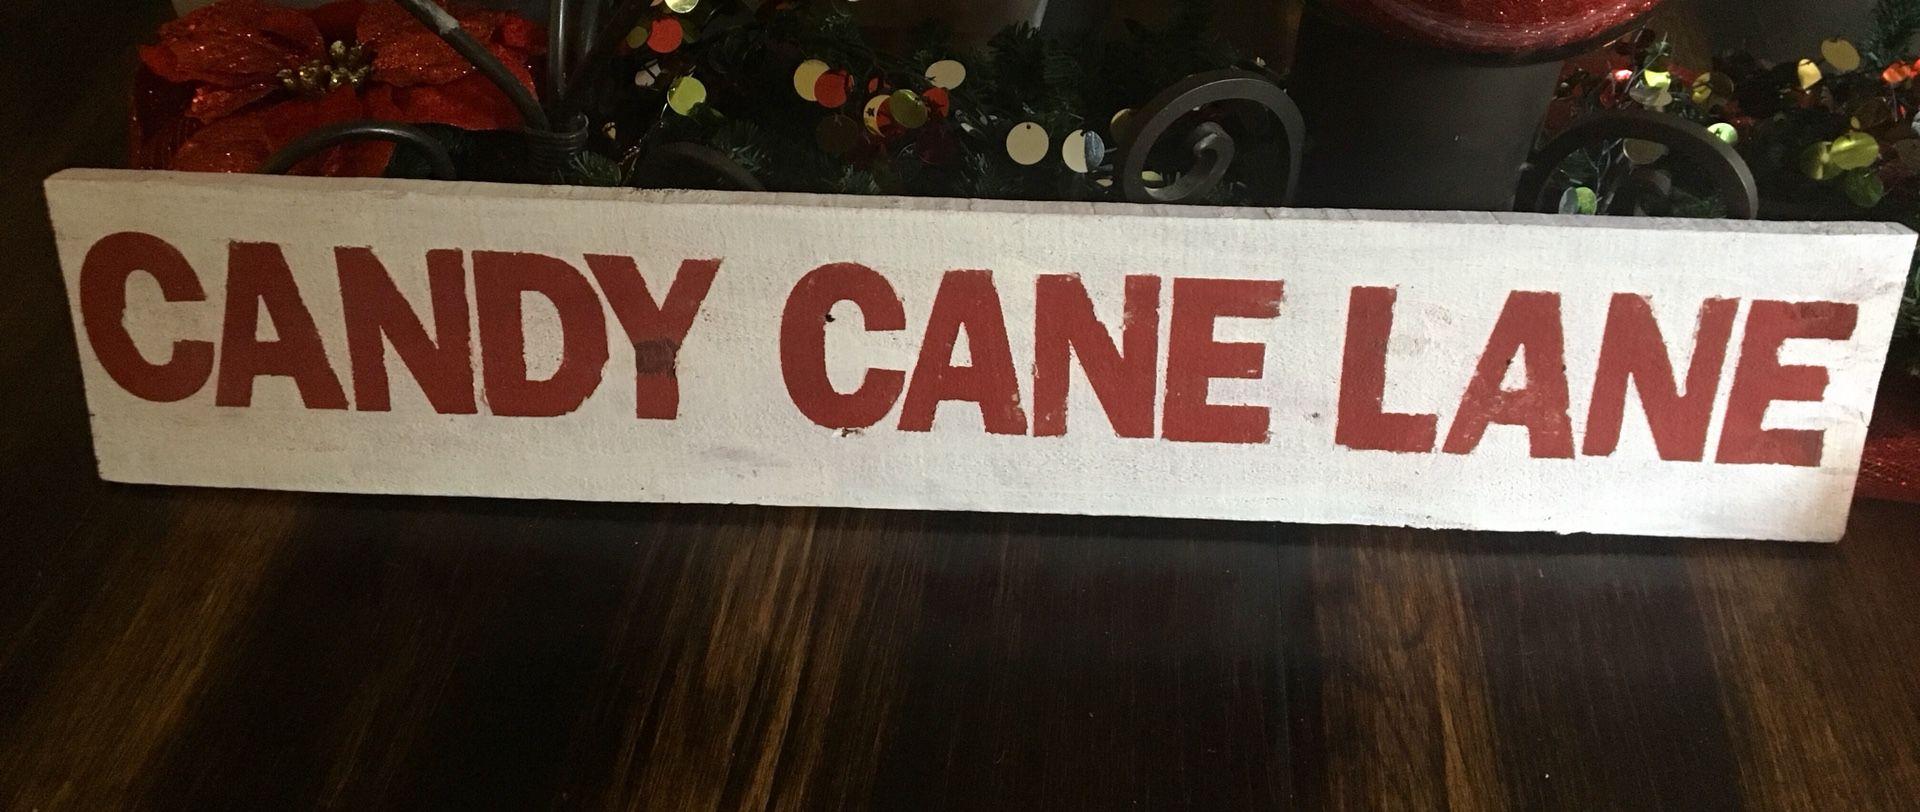 CANDY CANE LANE CHRISTMAS SIGN $20